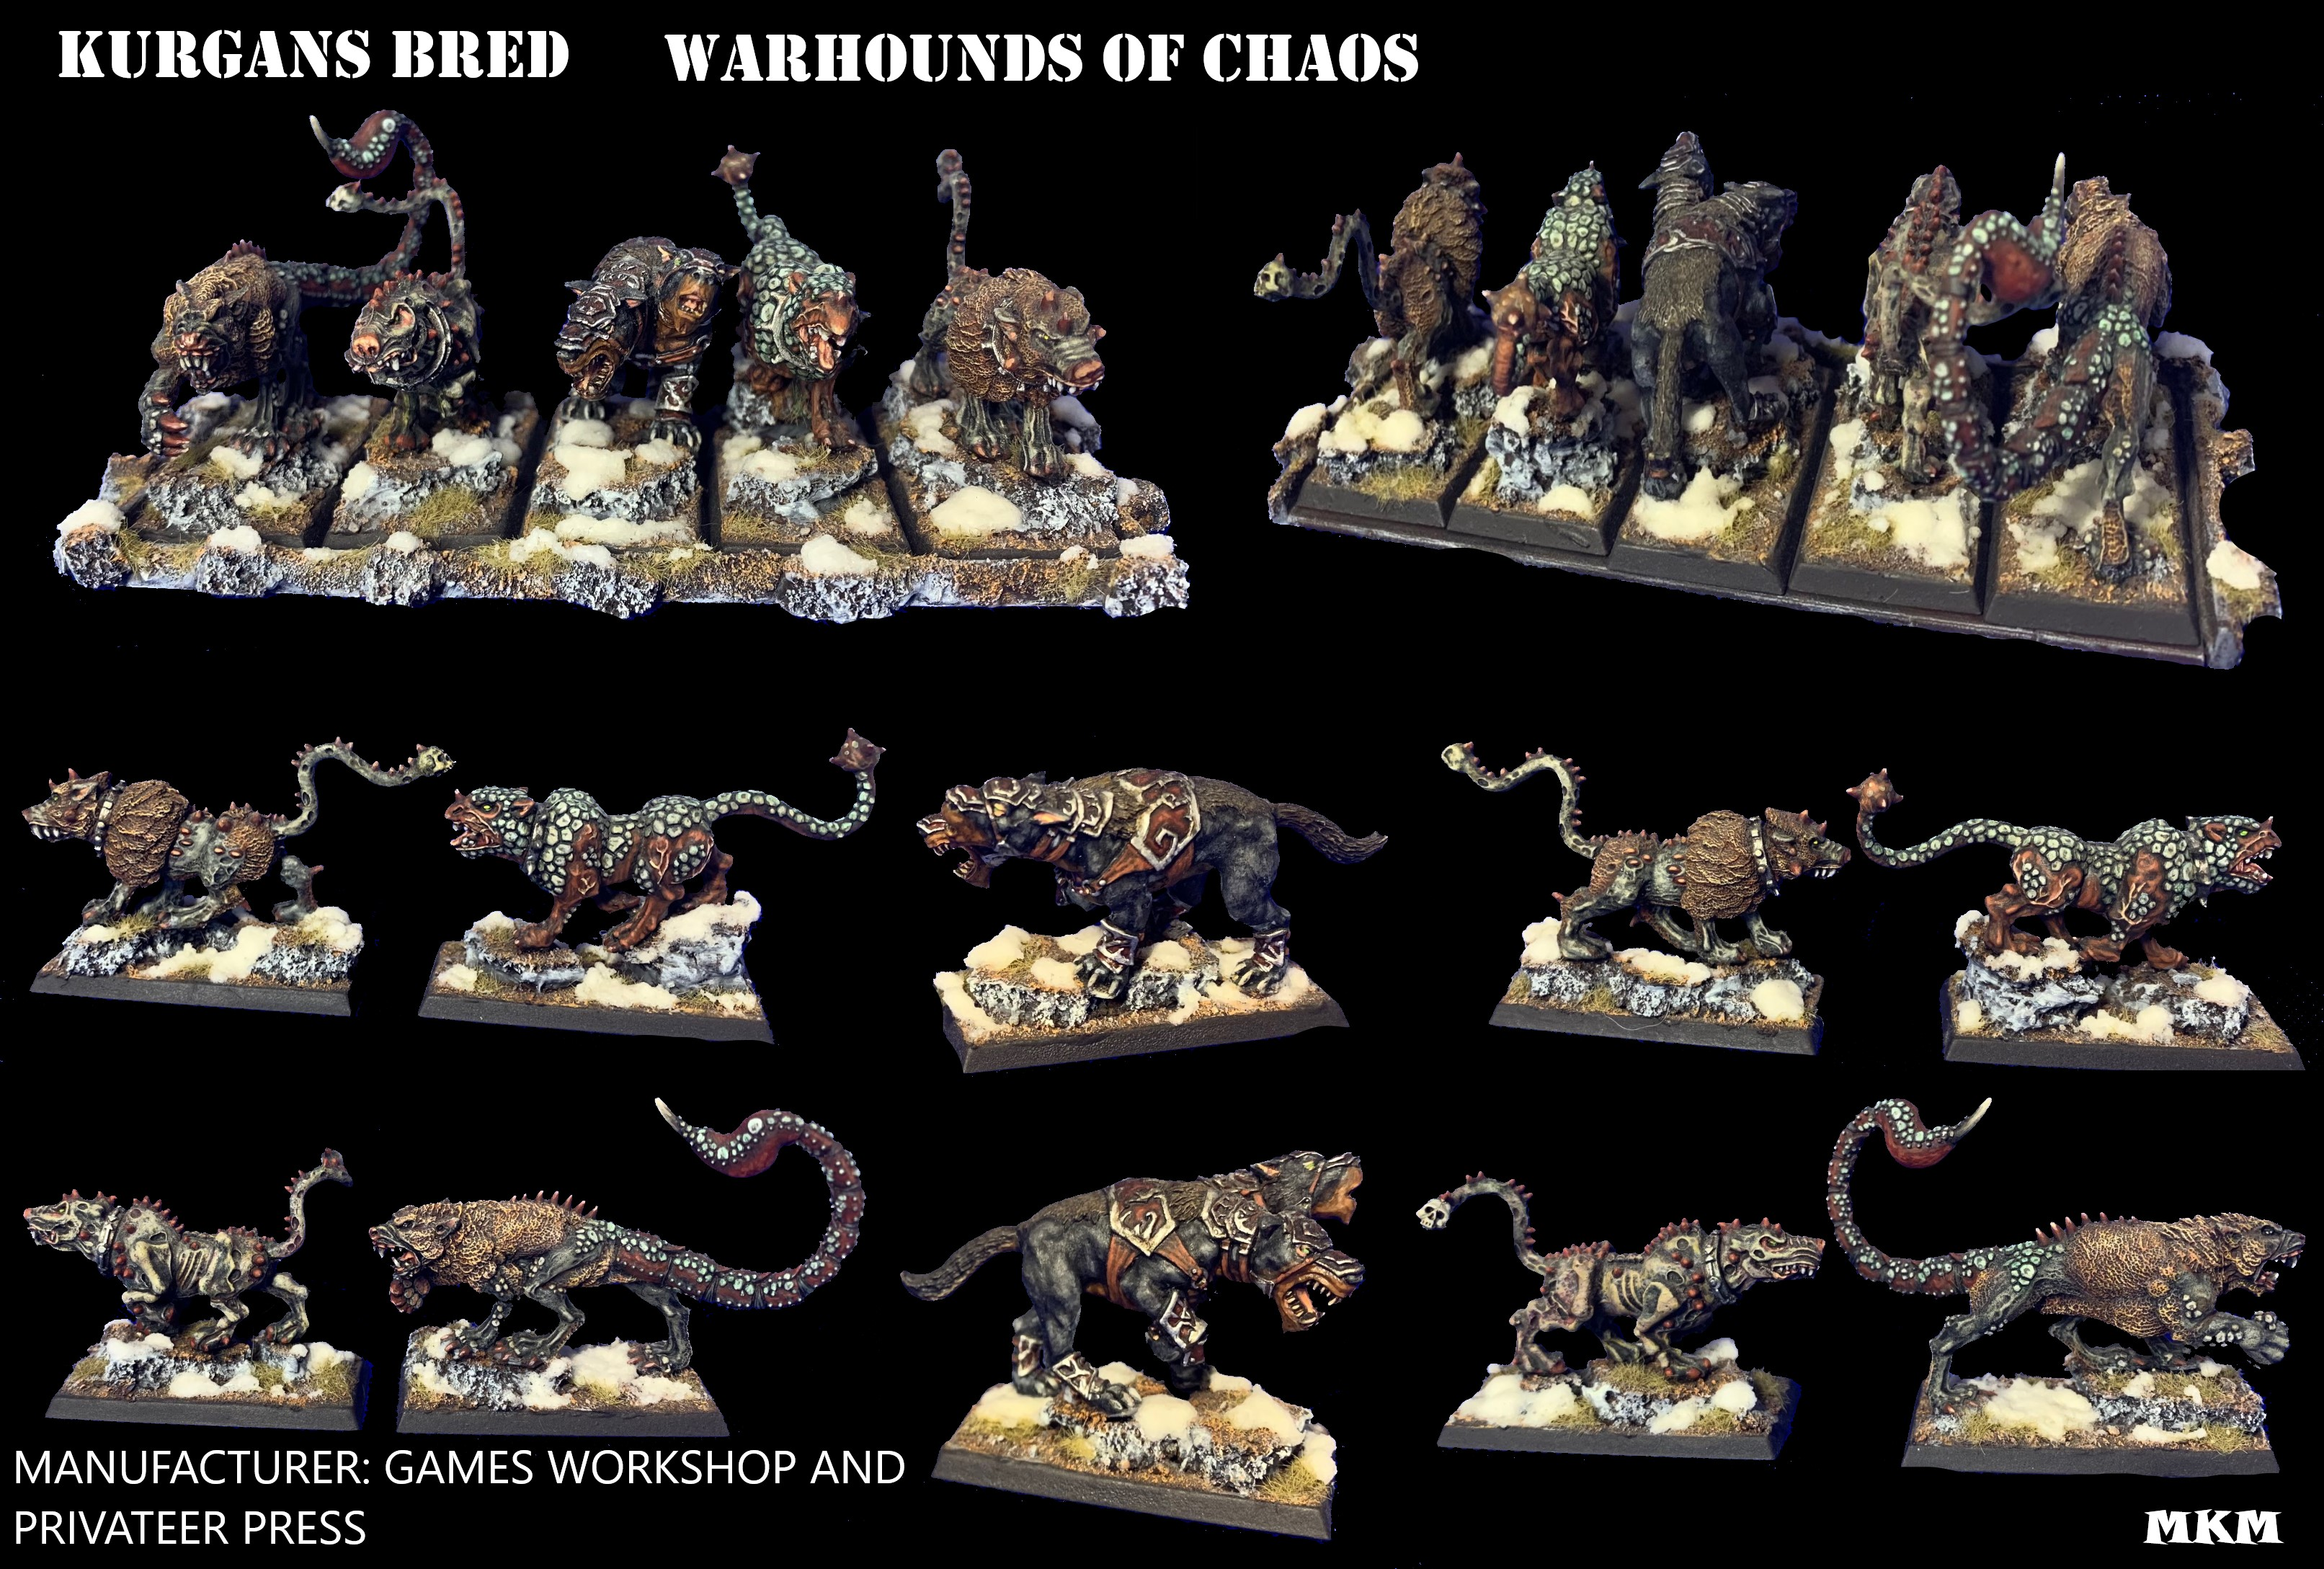 KURGANS BRED, Warhounds of Chaos